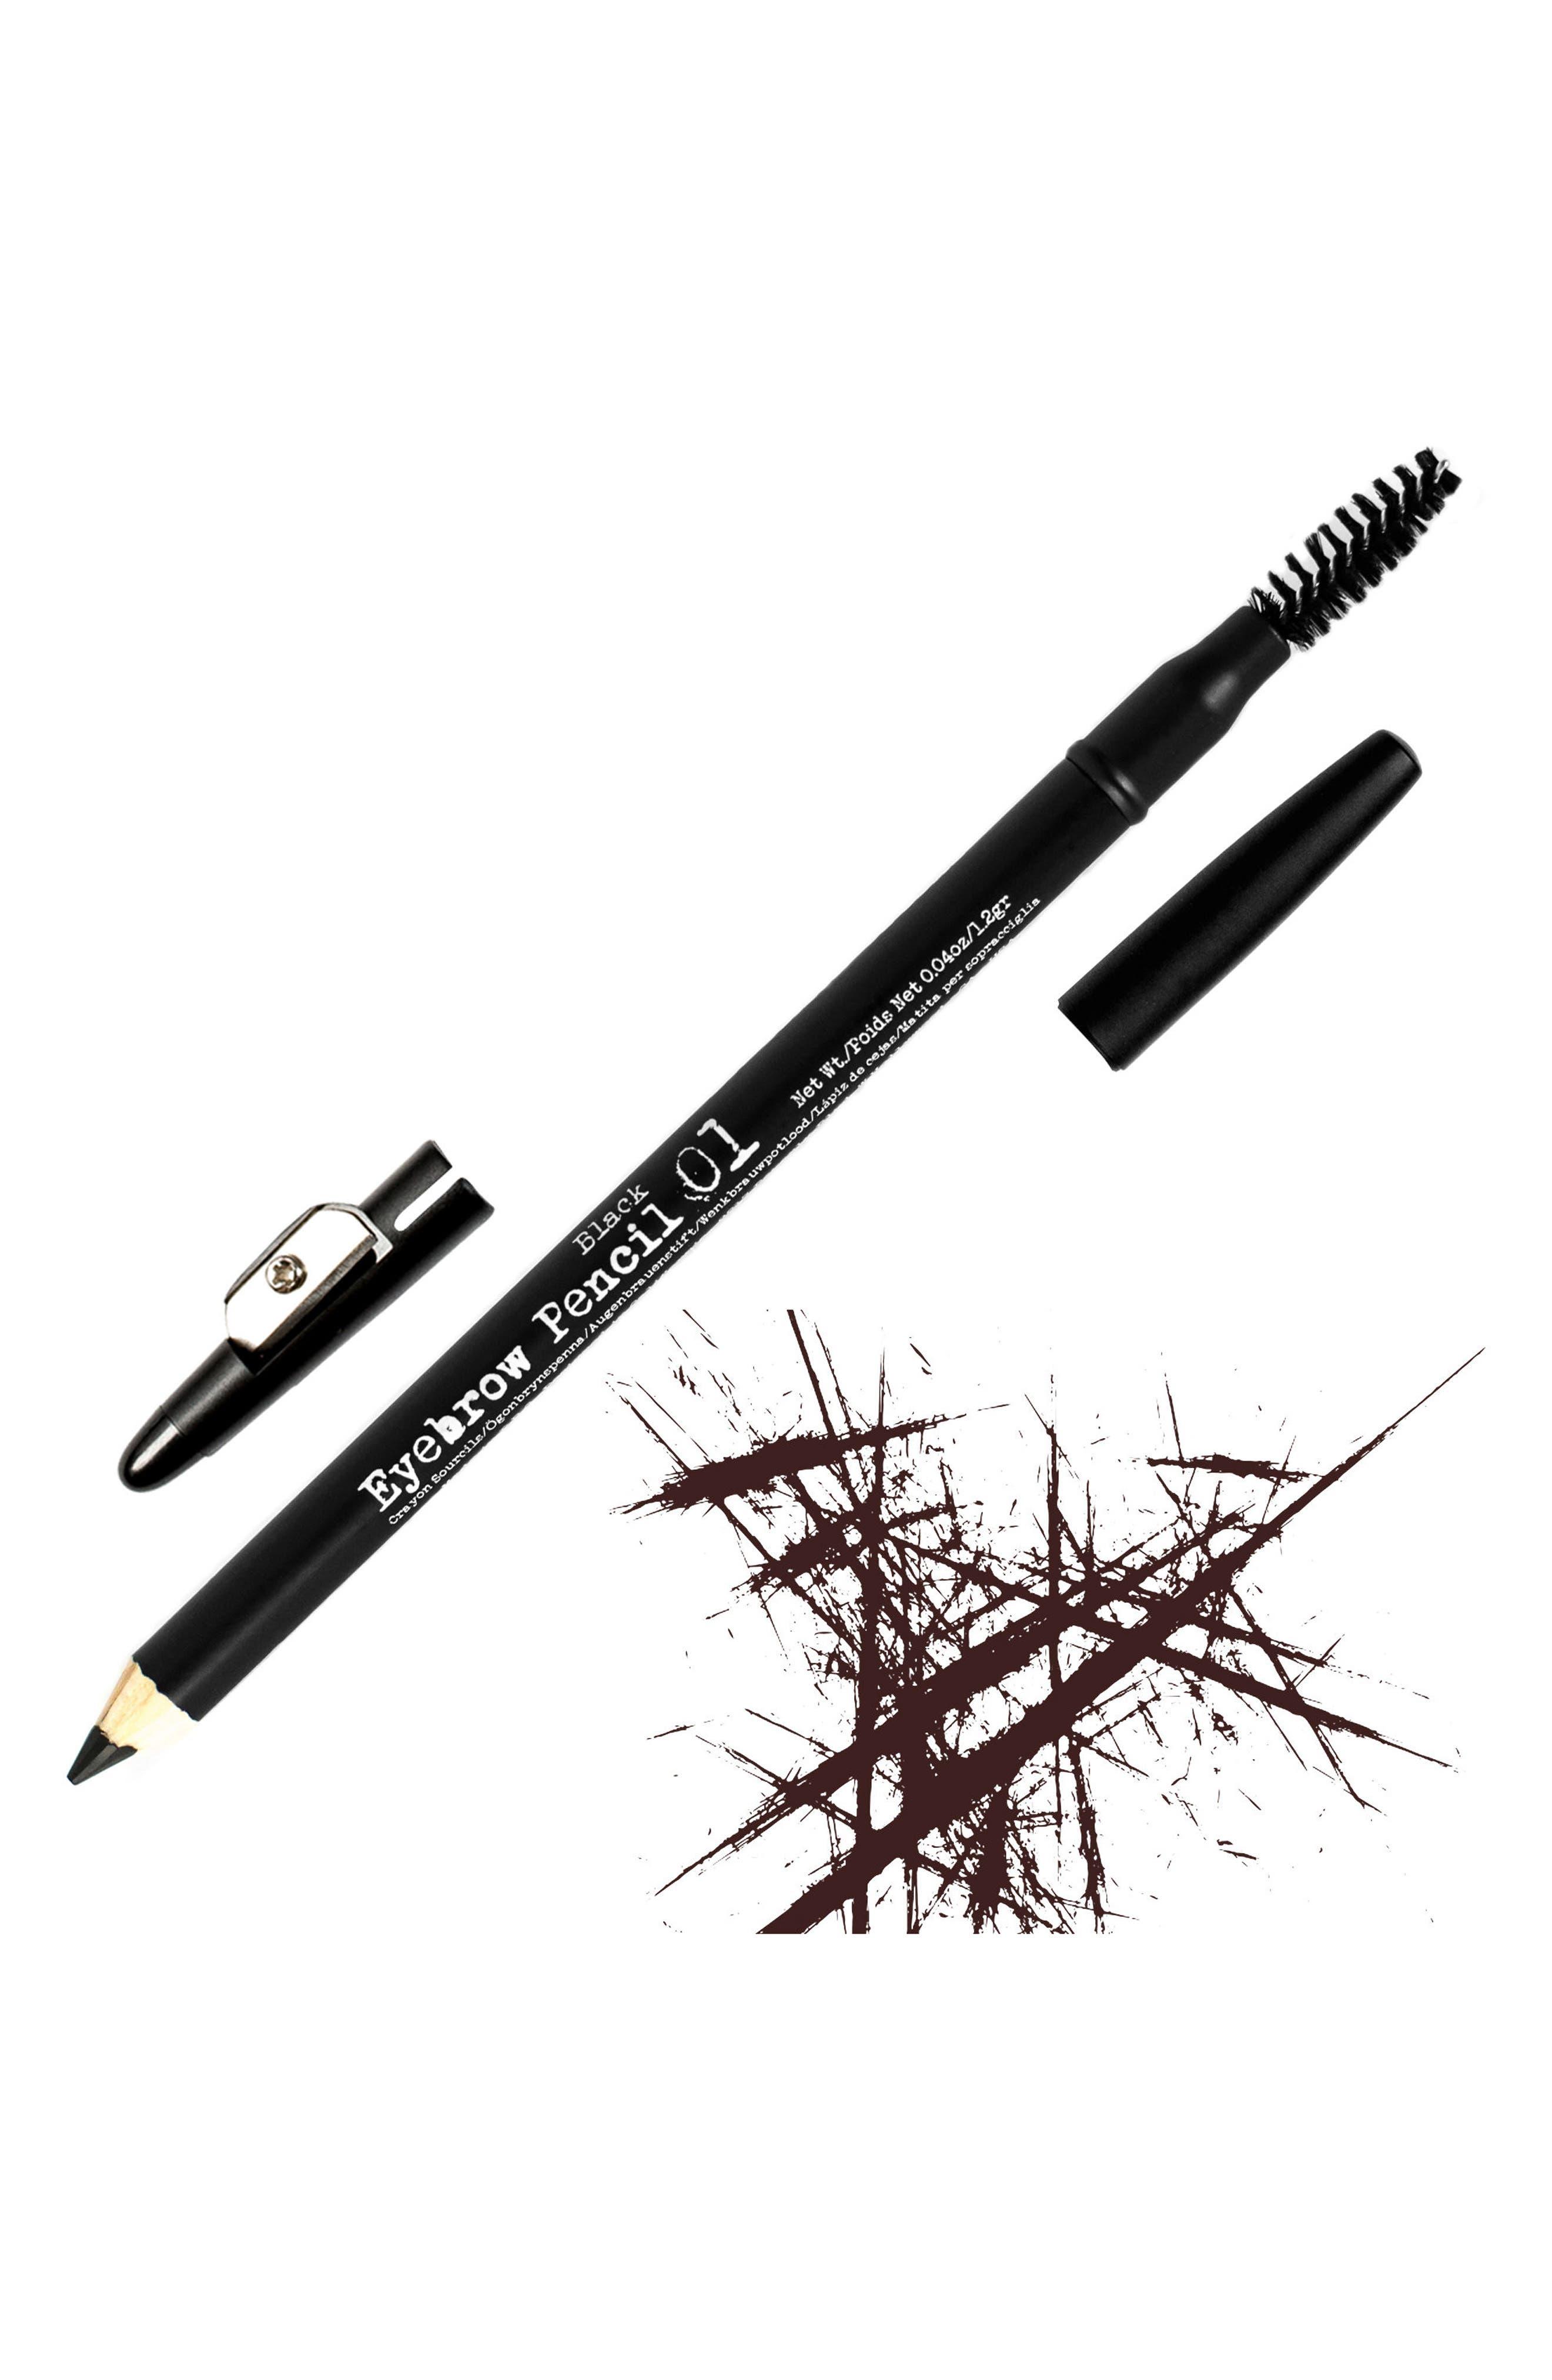 The BrowGal Eyebrow Pencil